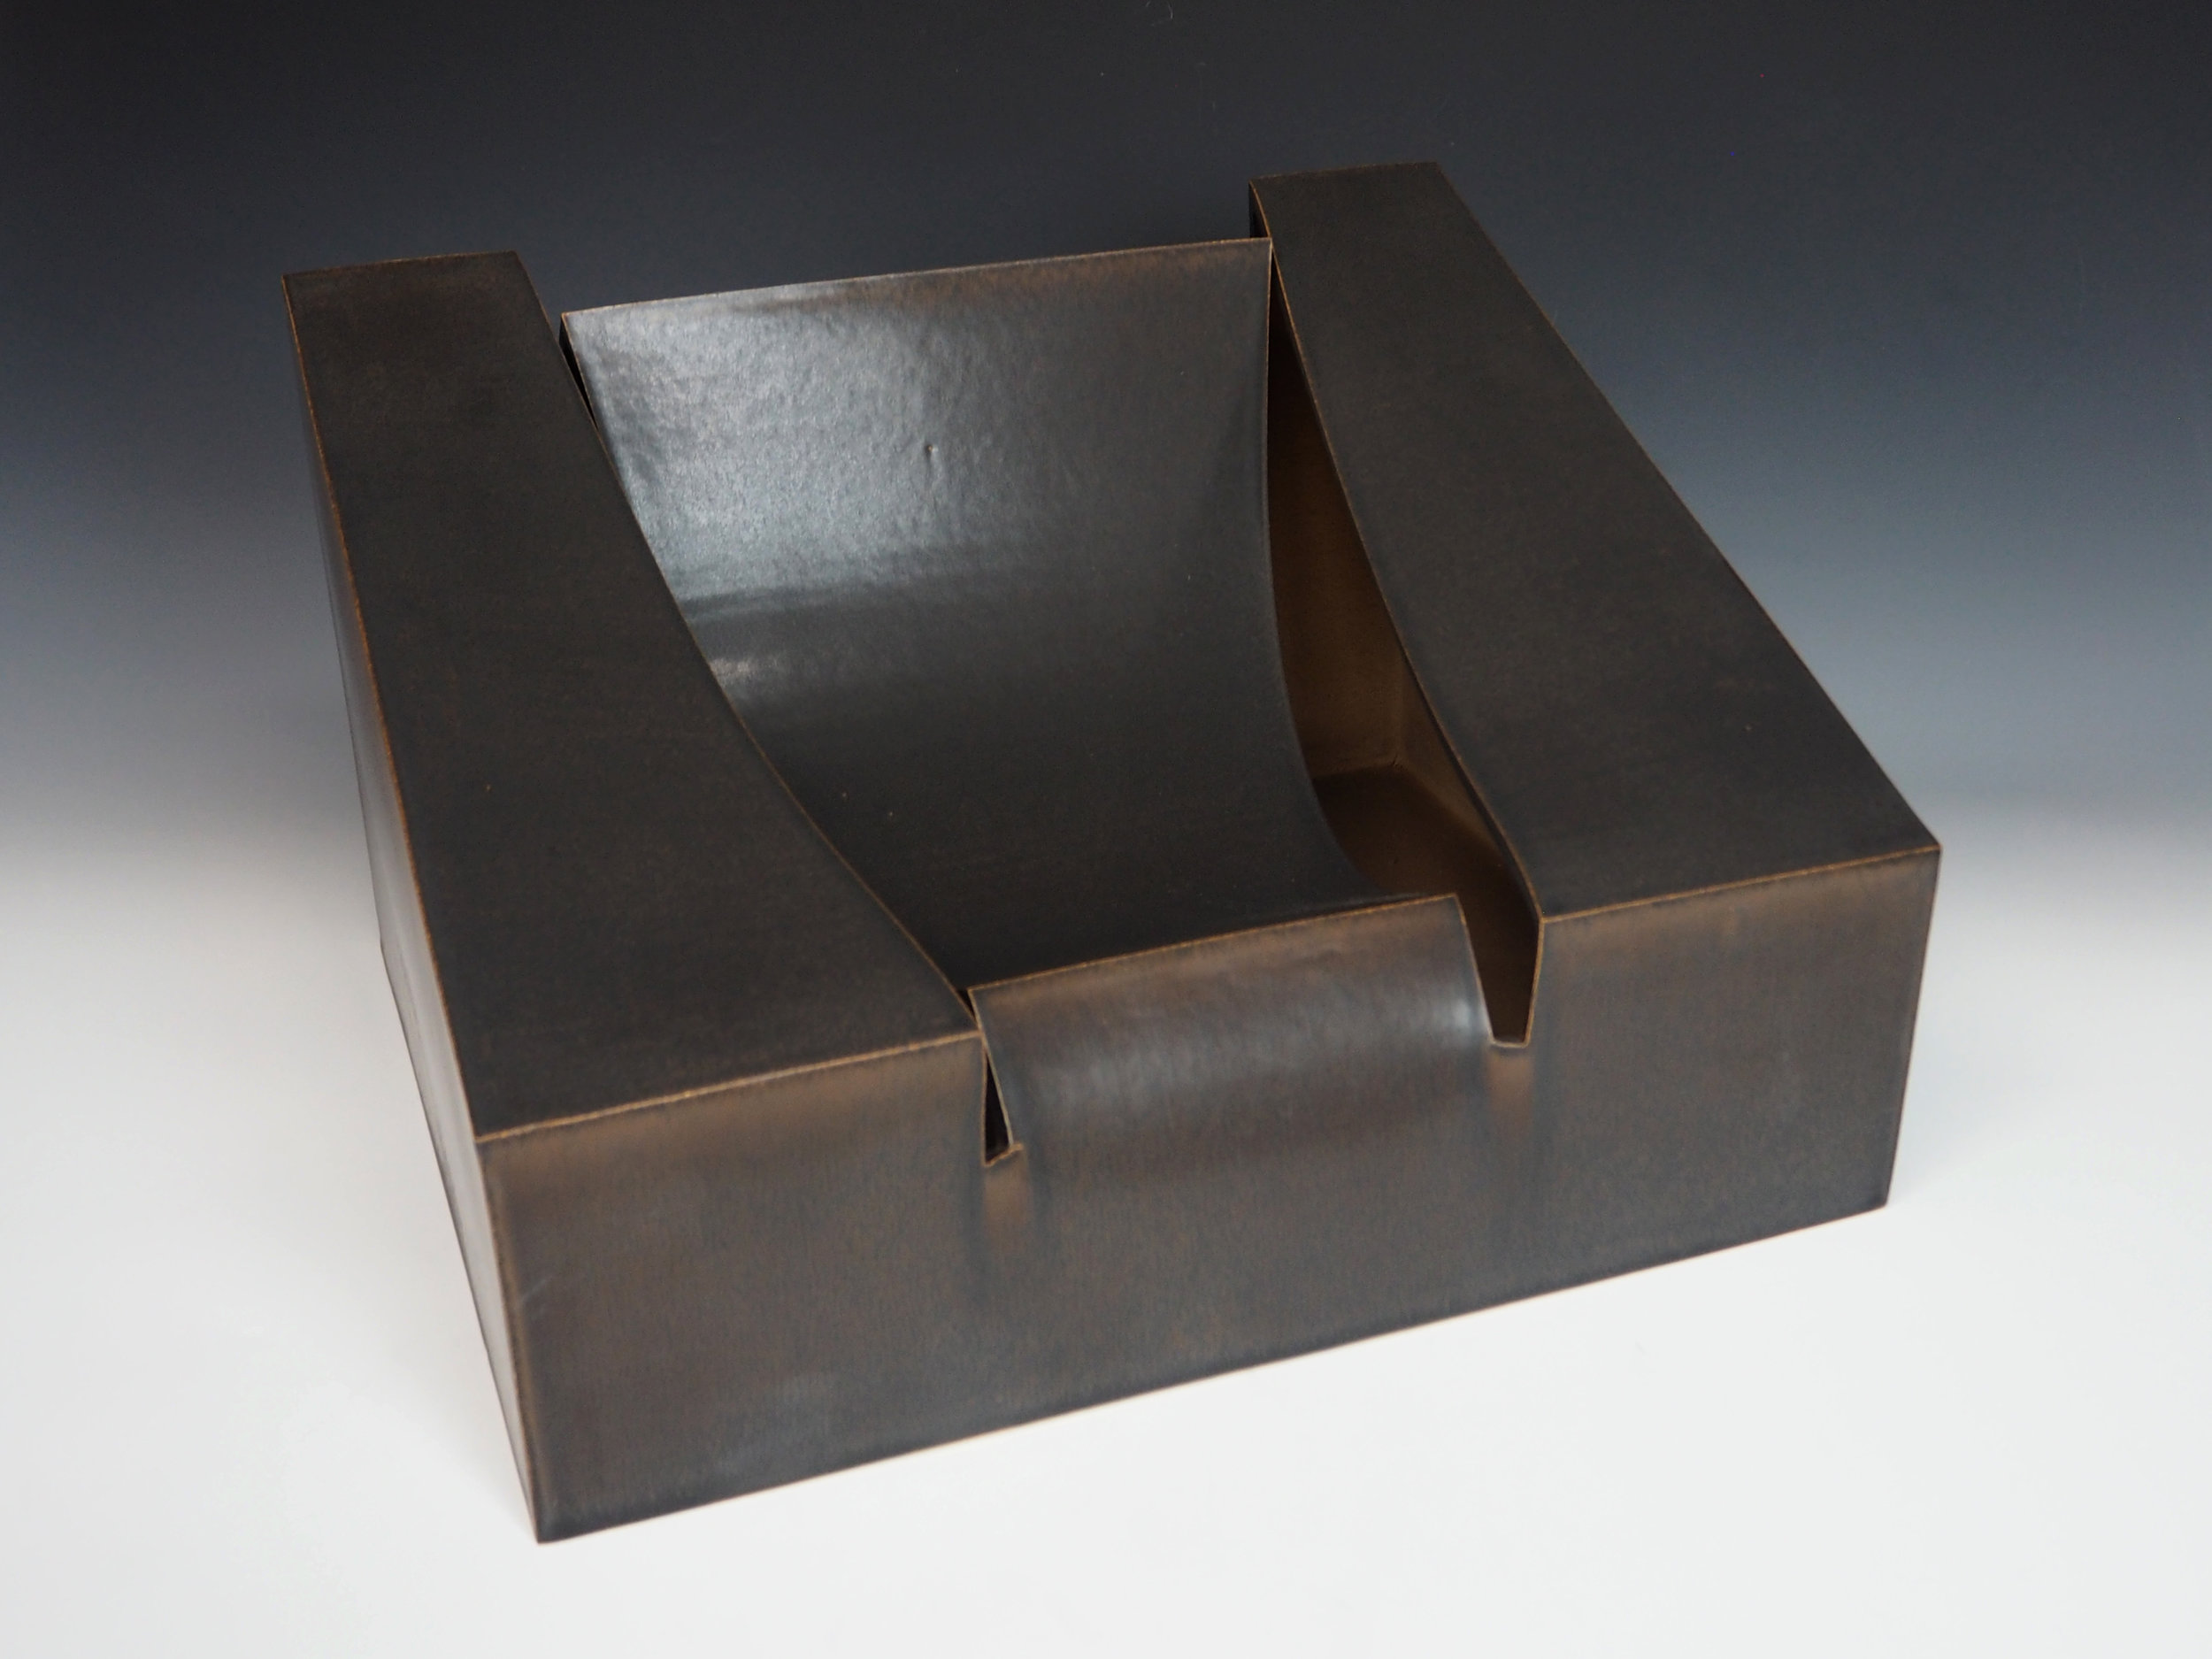 KIYOMIZU Rokubei VIII | Iron-glazed Pottery Sculpture